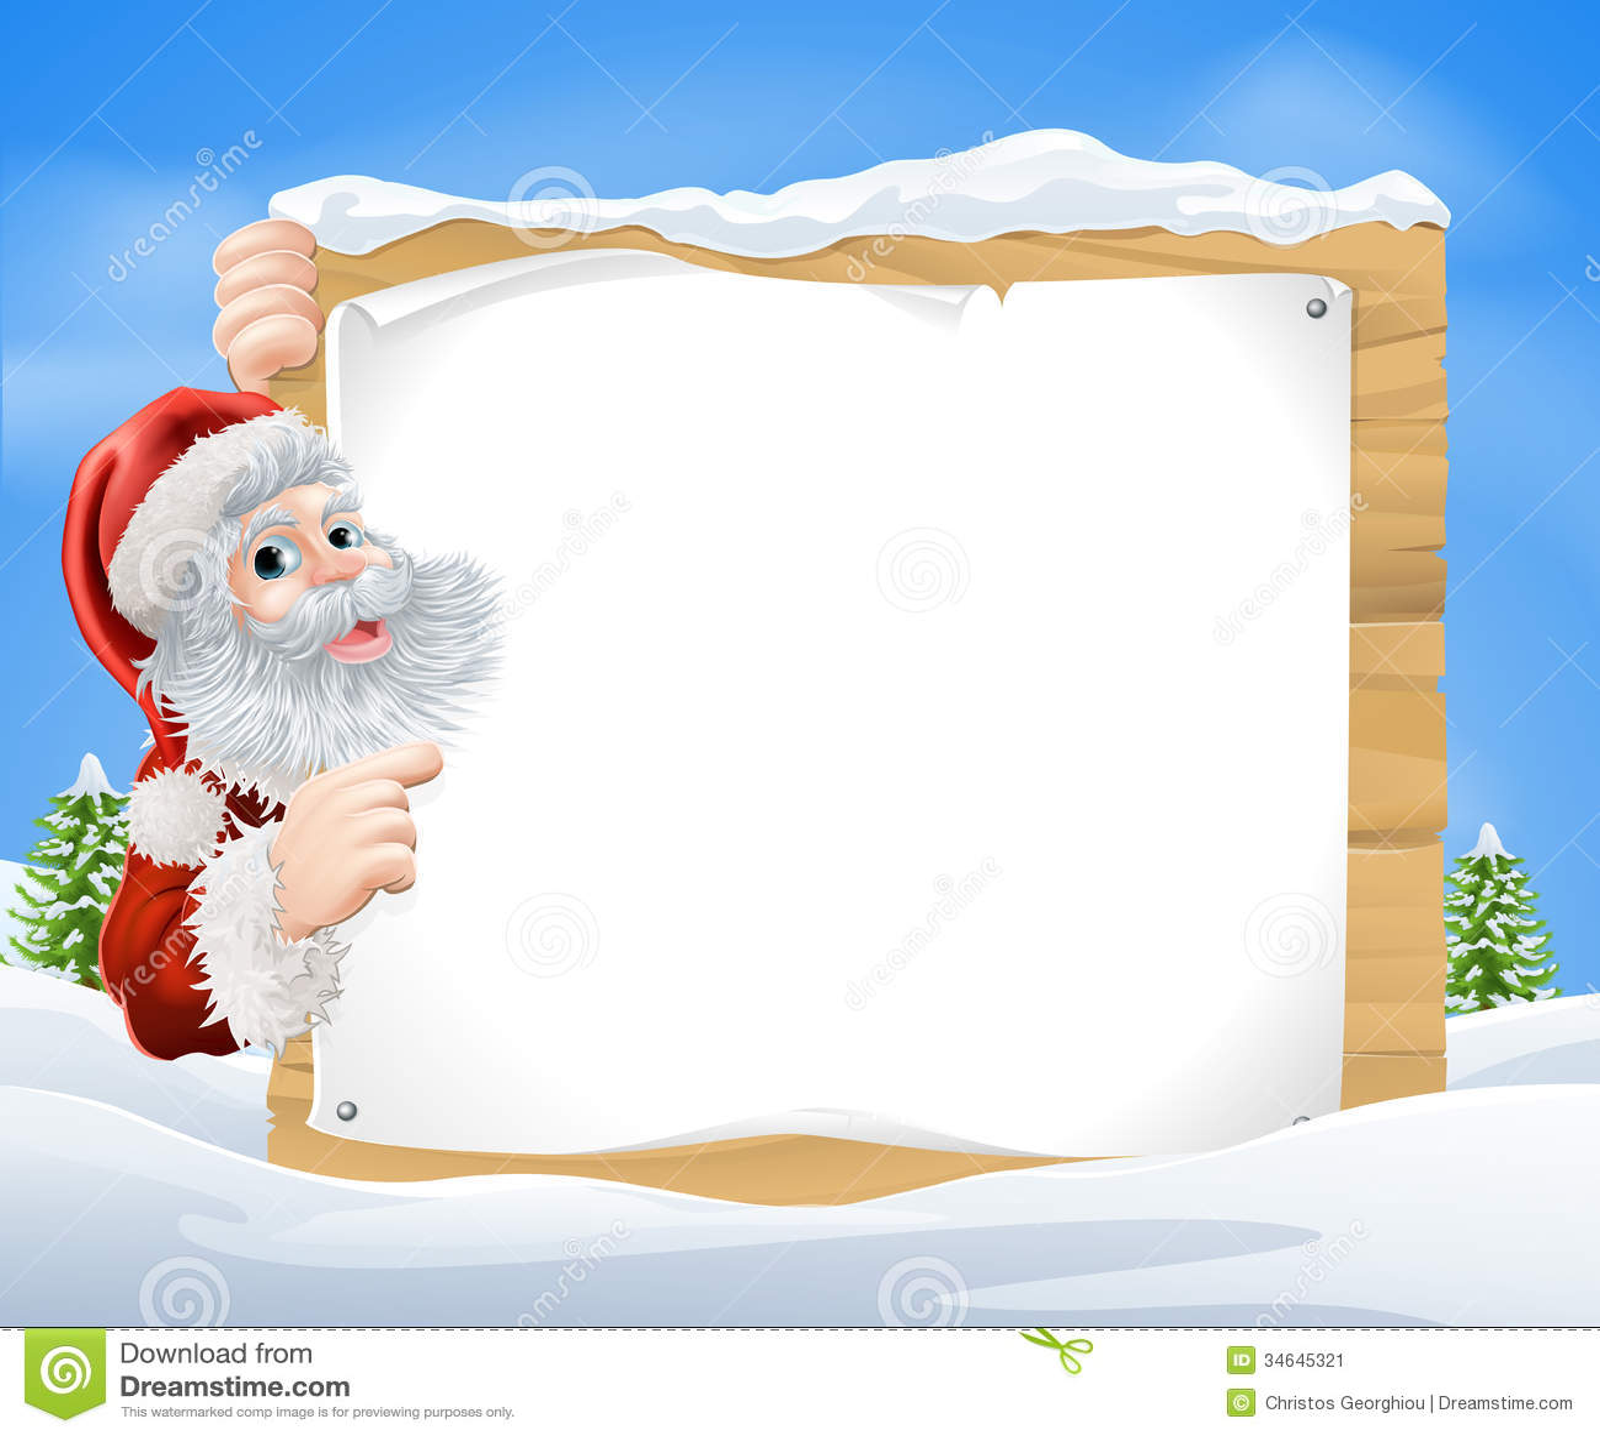 An illustration of a snow scene Christmas Santa sign with Santa Claus ...